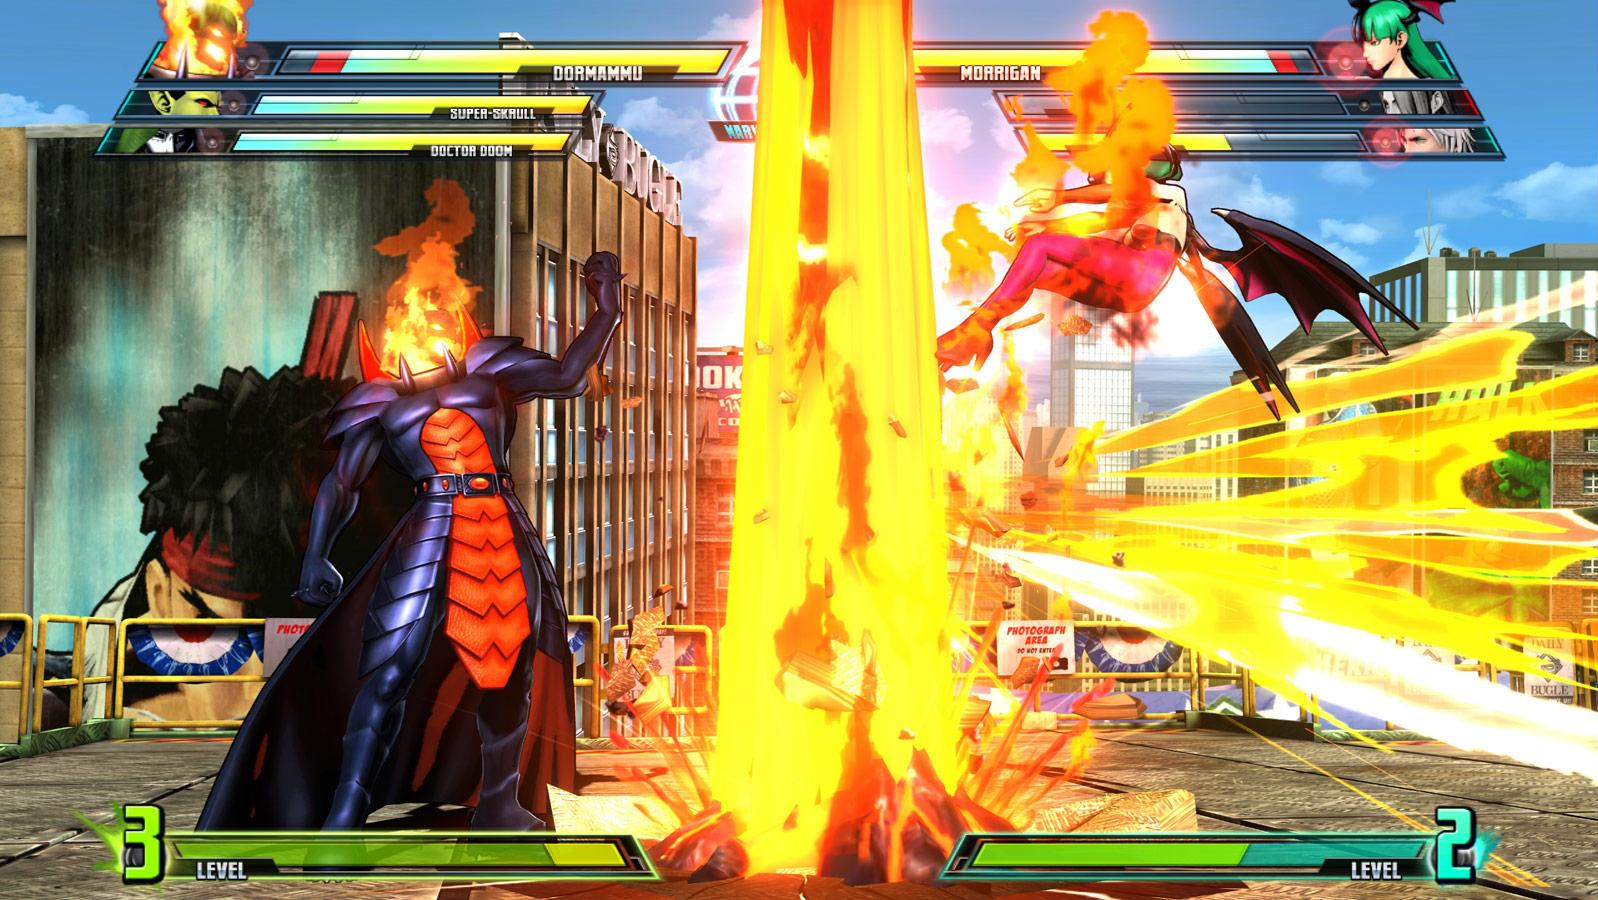 Marvel vs. Capcom 3 screen shot Aug. 18 image #7